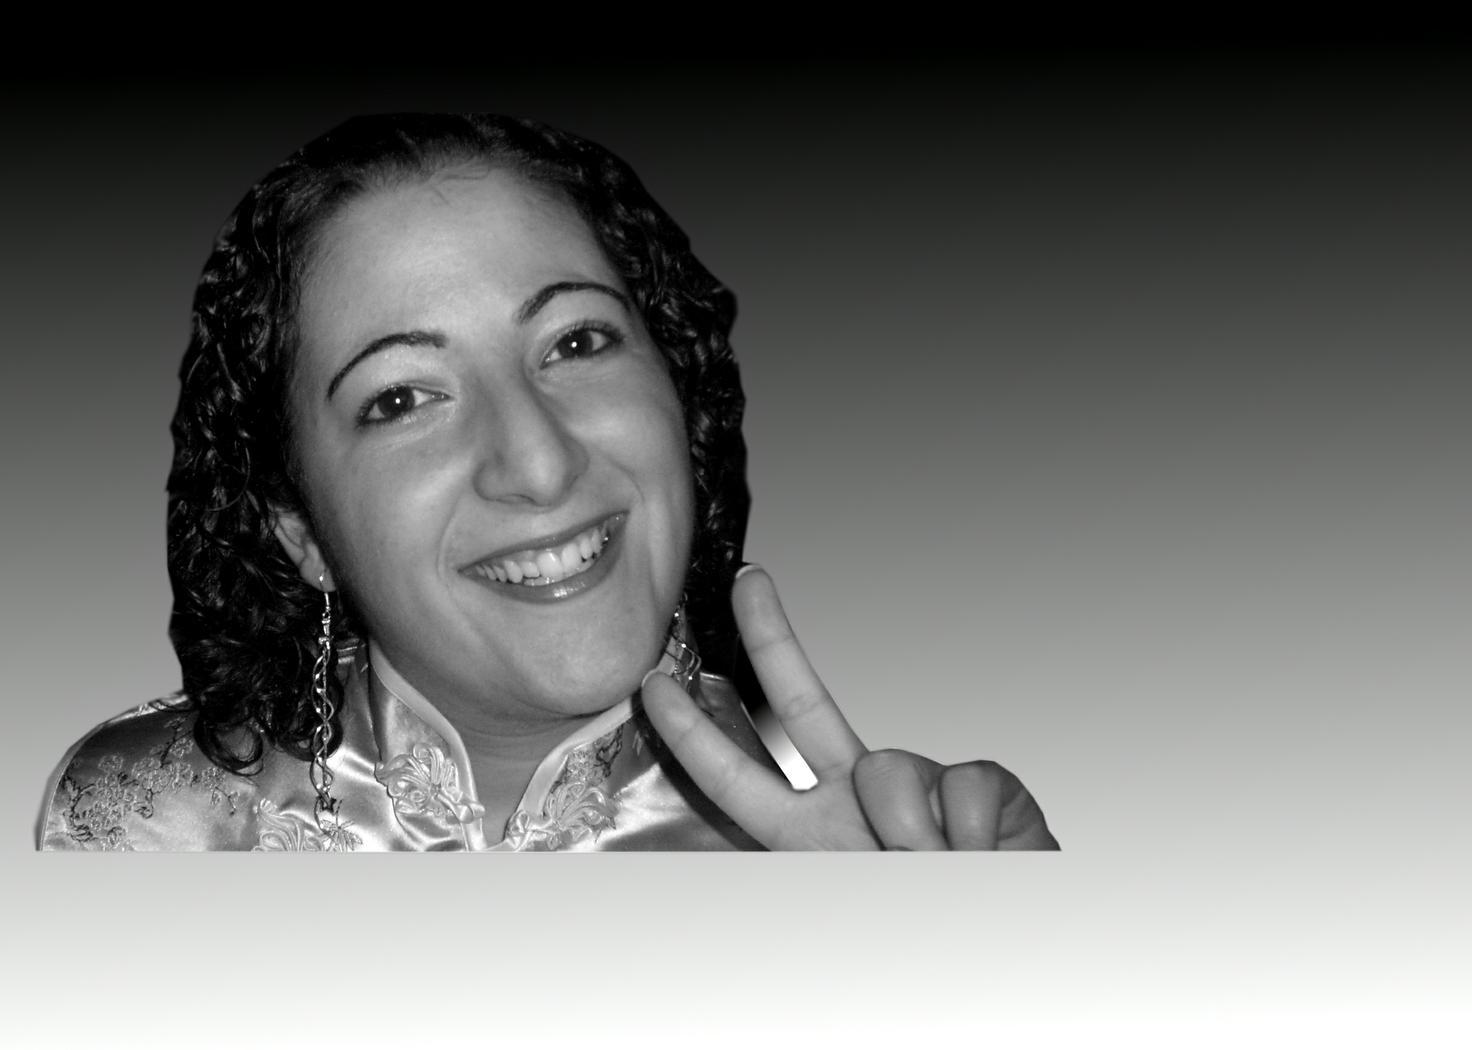 Luisa Petrolo